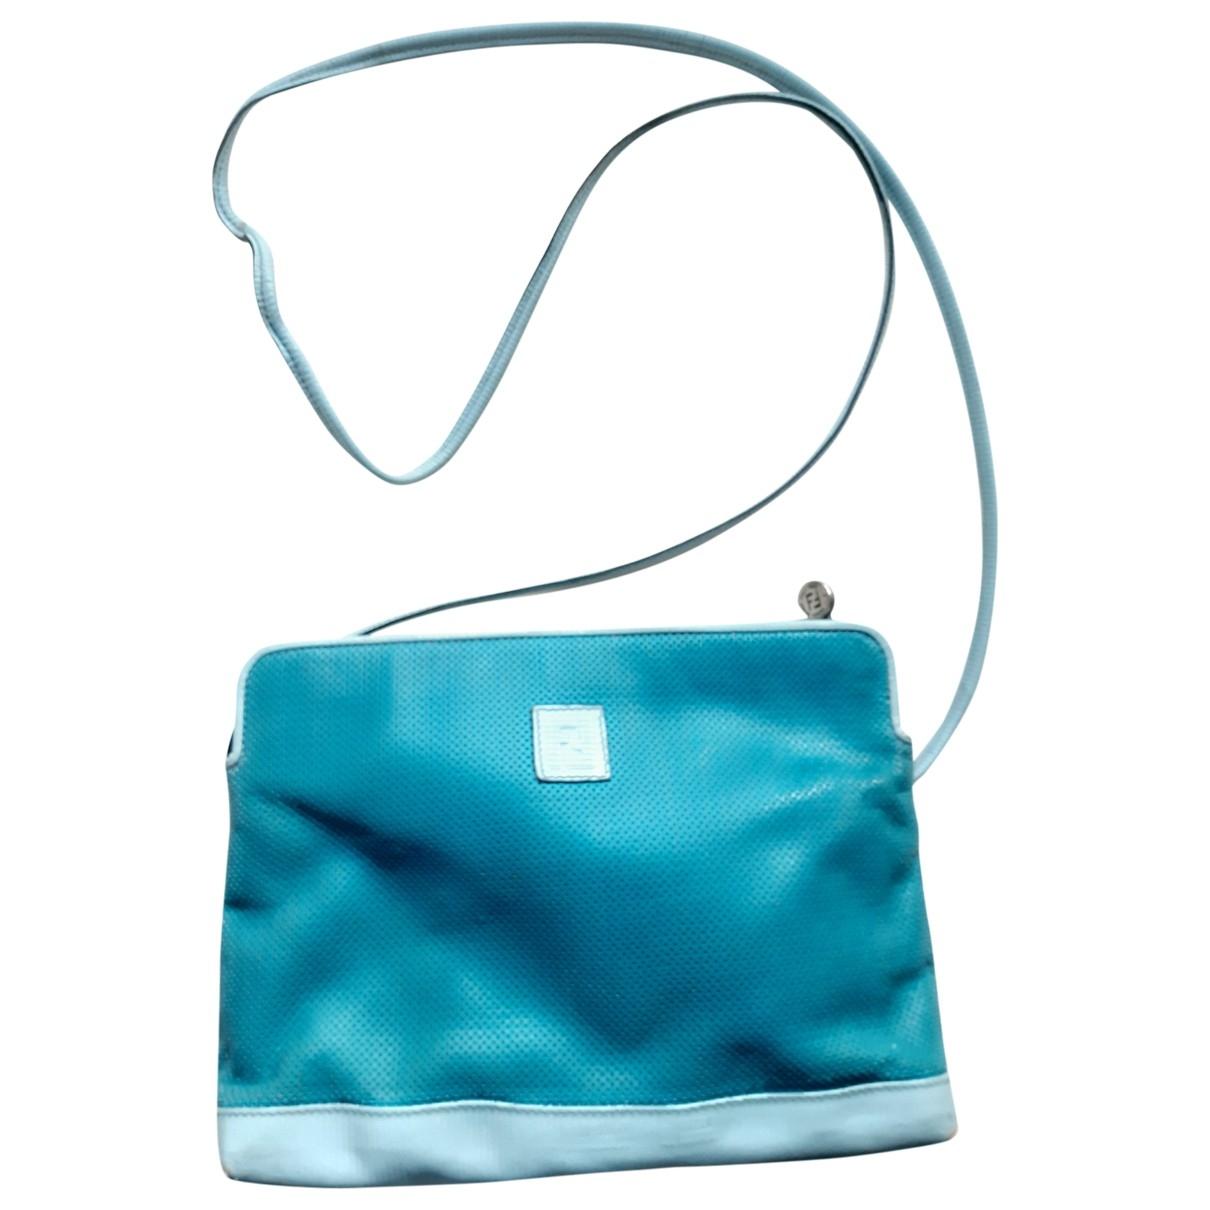 Fendi \N Turquoise Cloth handbag for Women \N